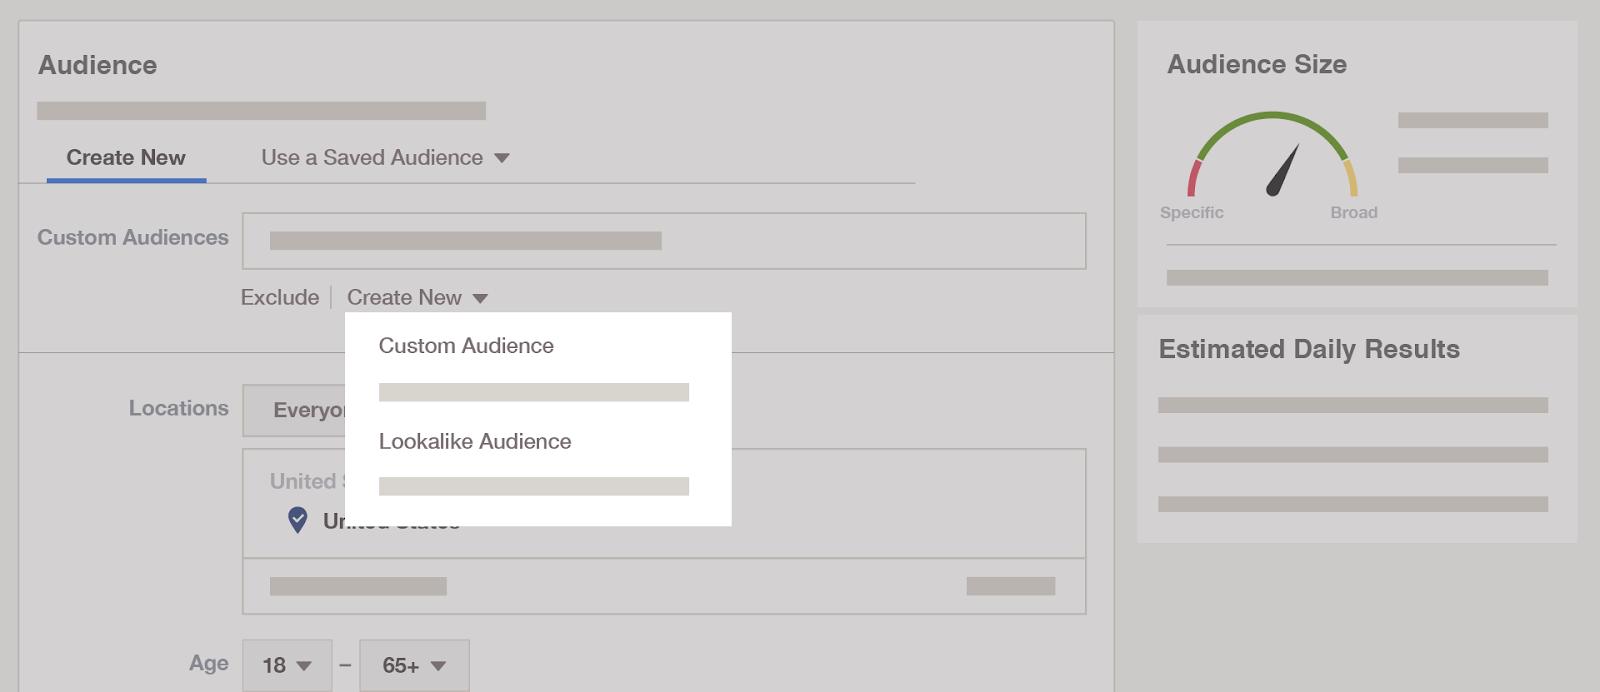 Email list set up - Lookalike Audience.